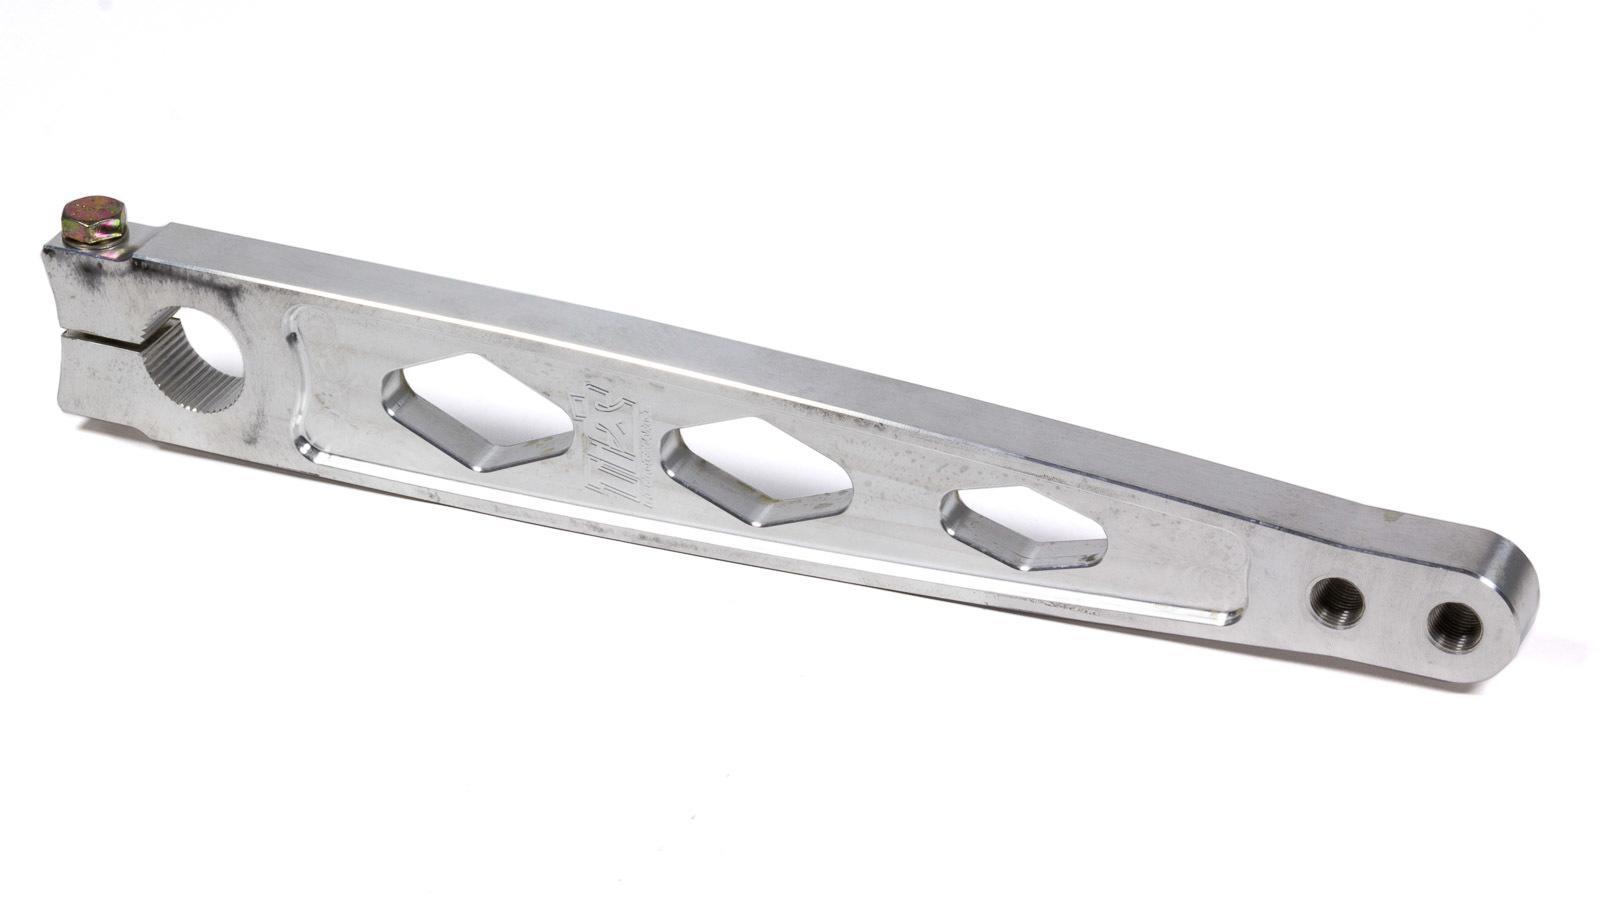 Ti22 Performance 3045 Pitman Arm, Straight Broach, Aluminum, Natural, Sprint Car, Each